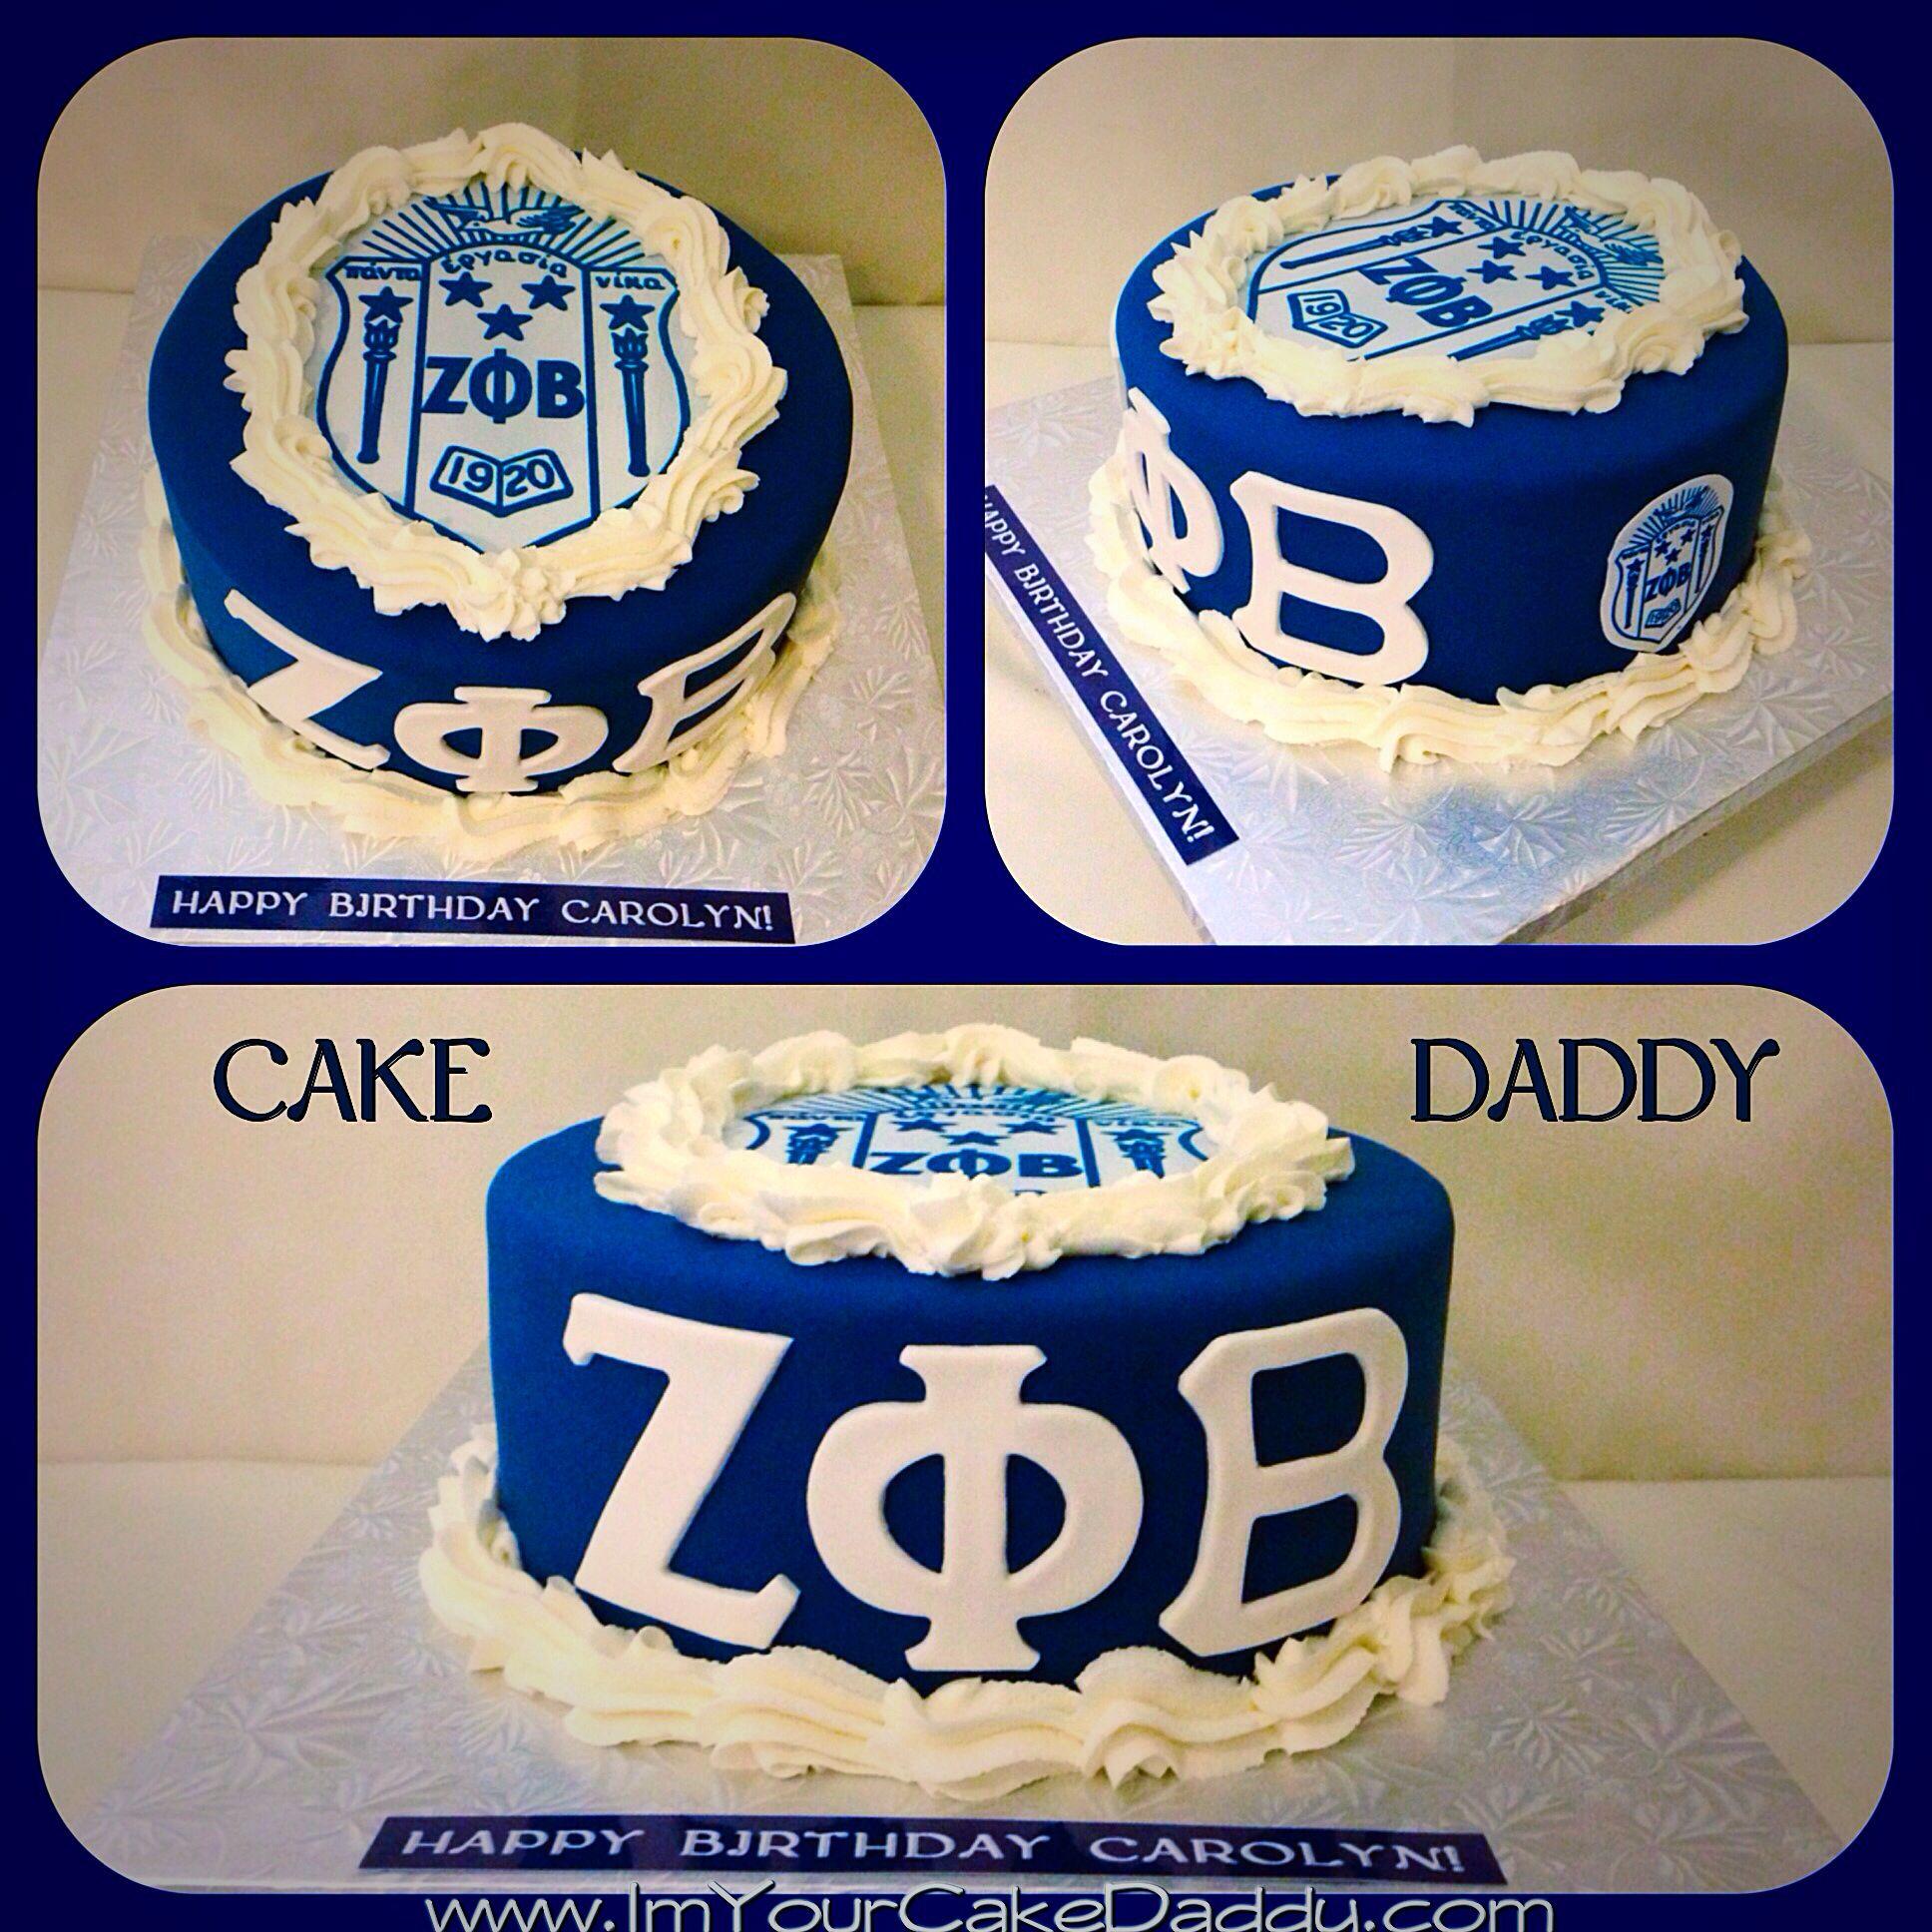 Zeta Phi Beta birthday cake..